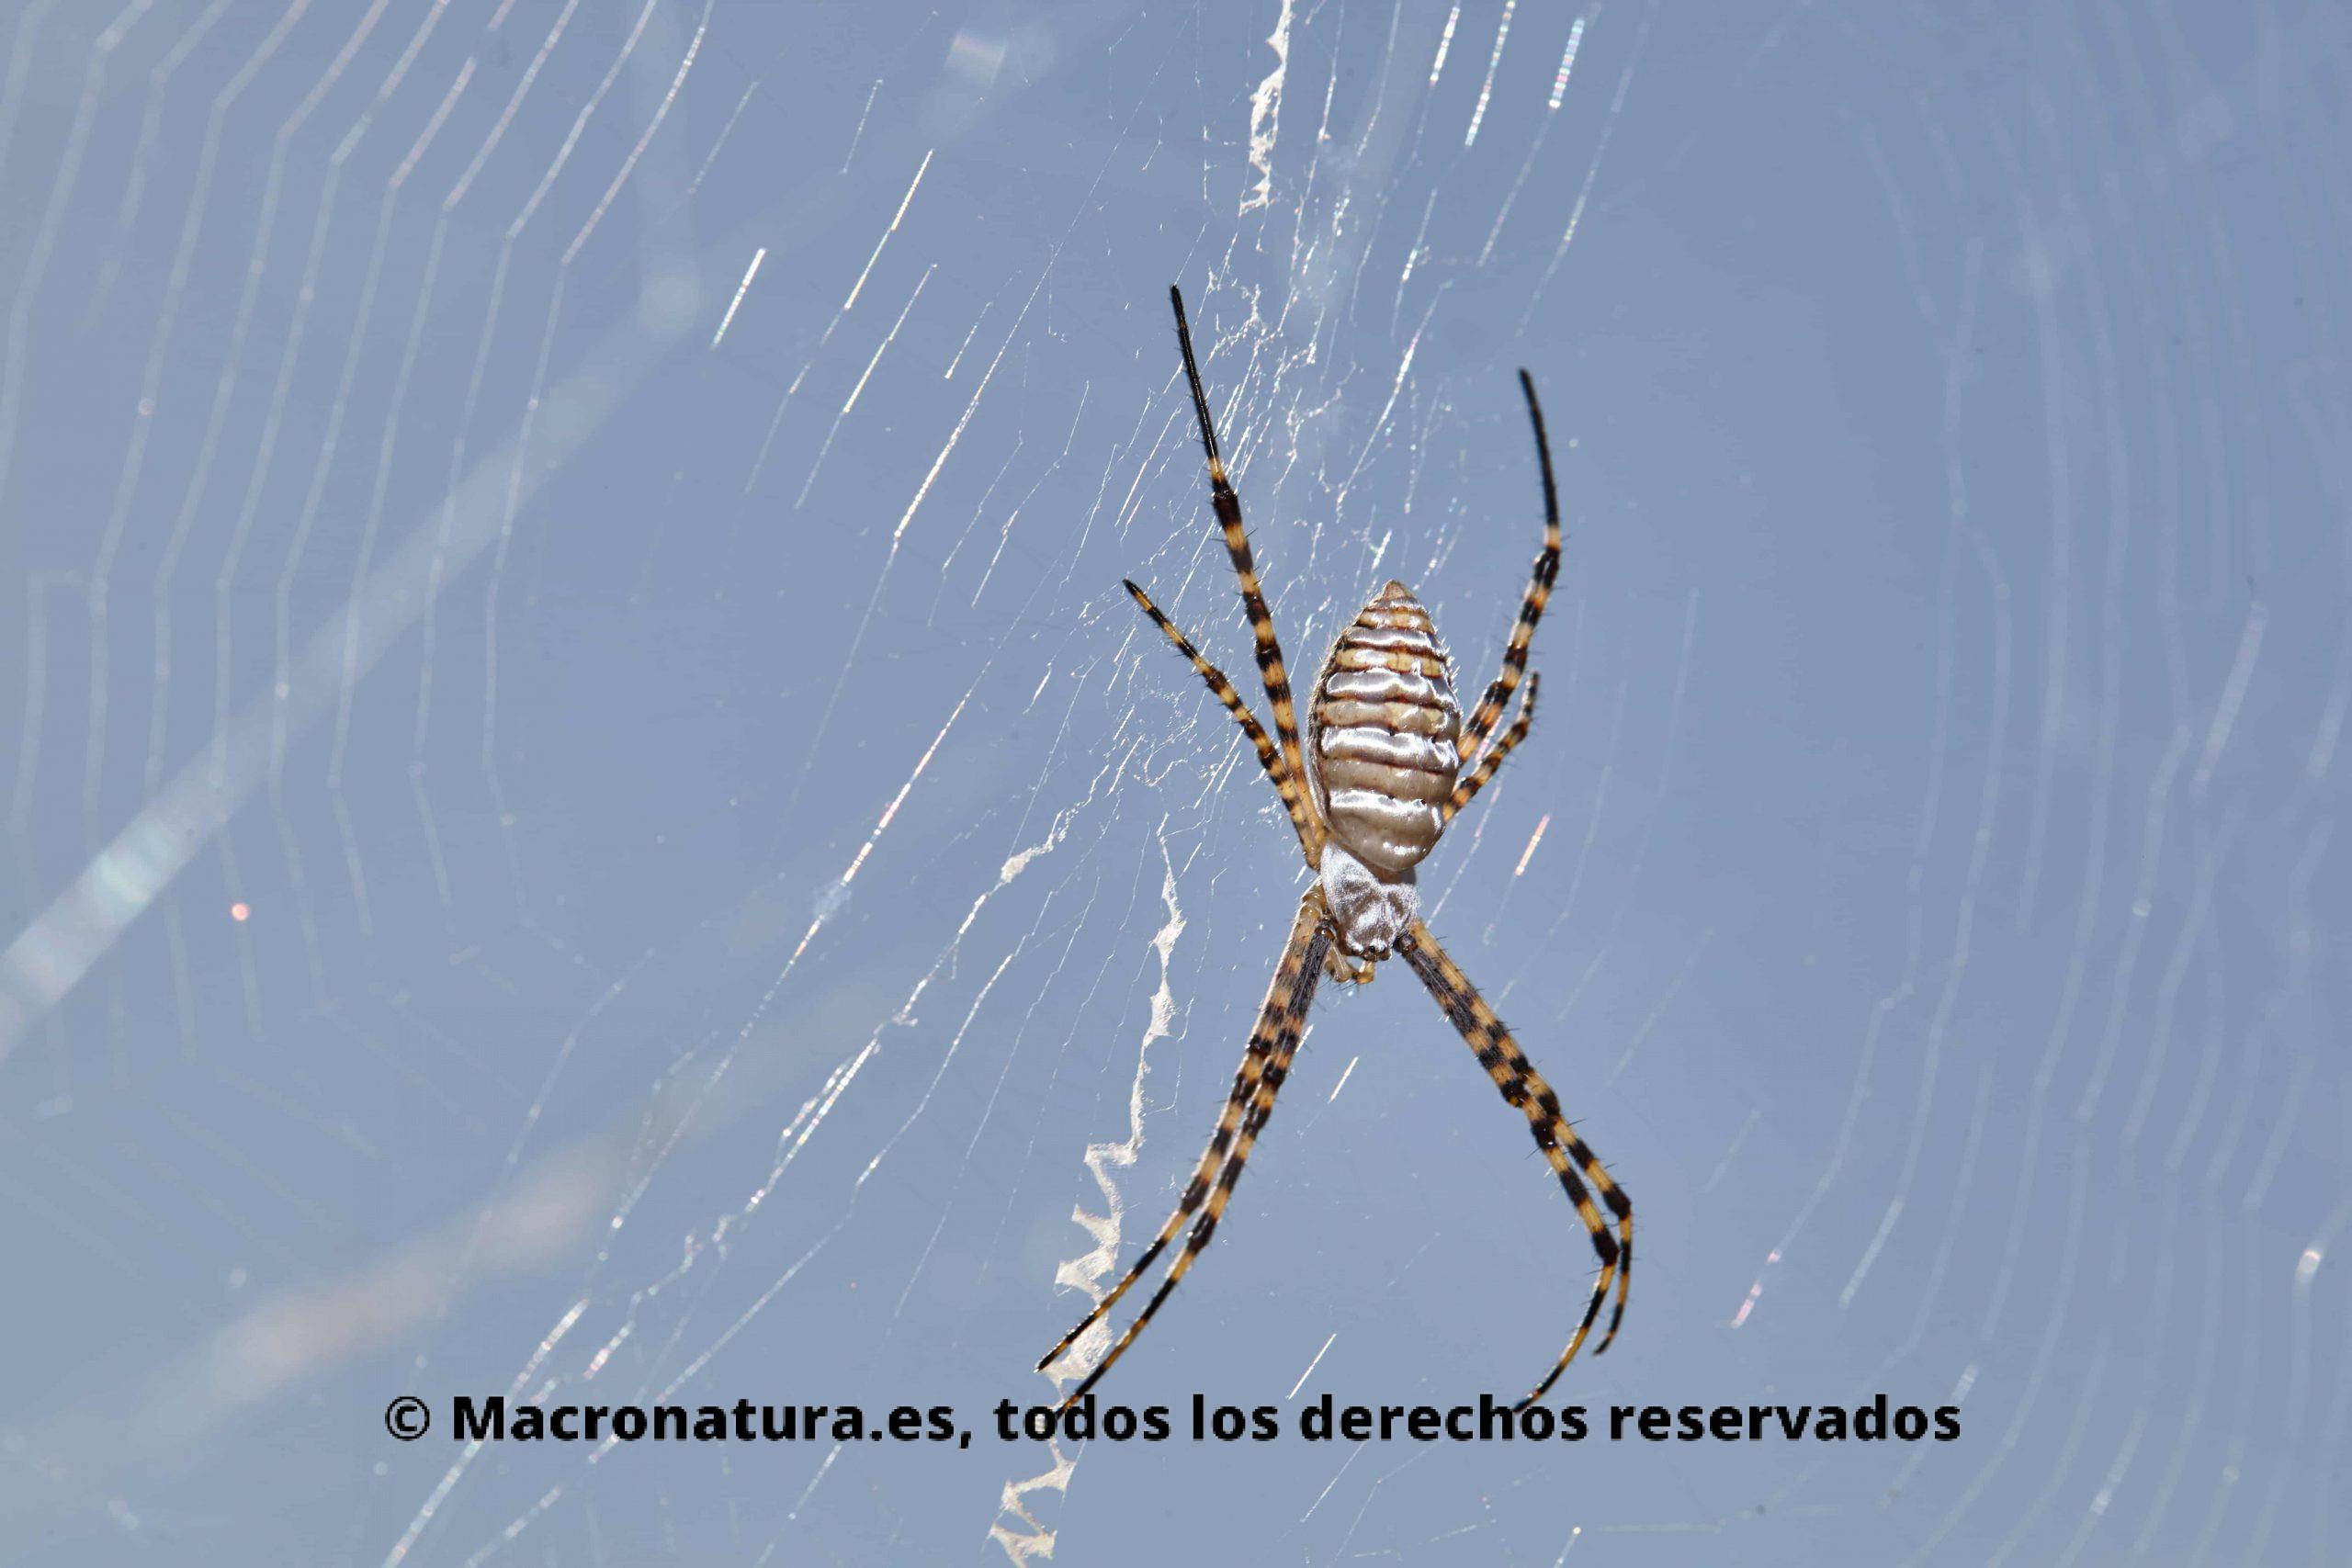 Araña Argiope Trifasciata. Araña de jardín bandeada en su tela de araña